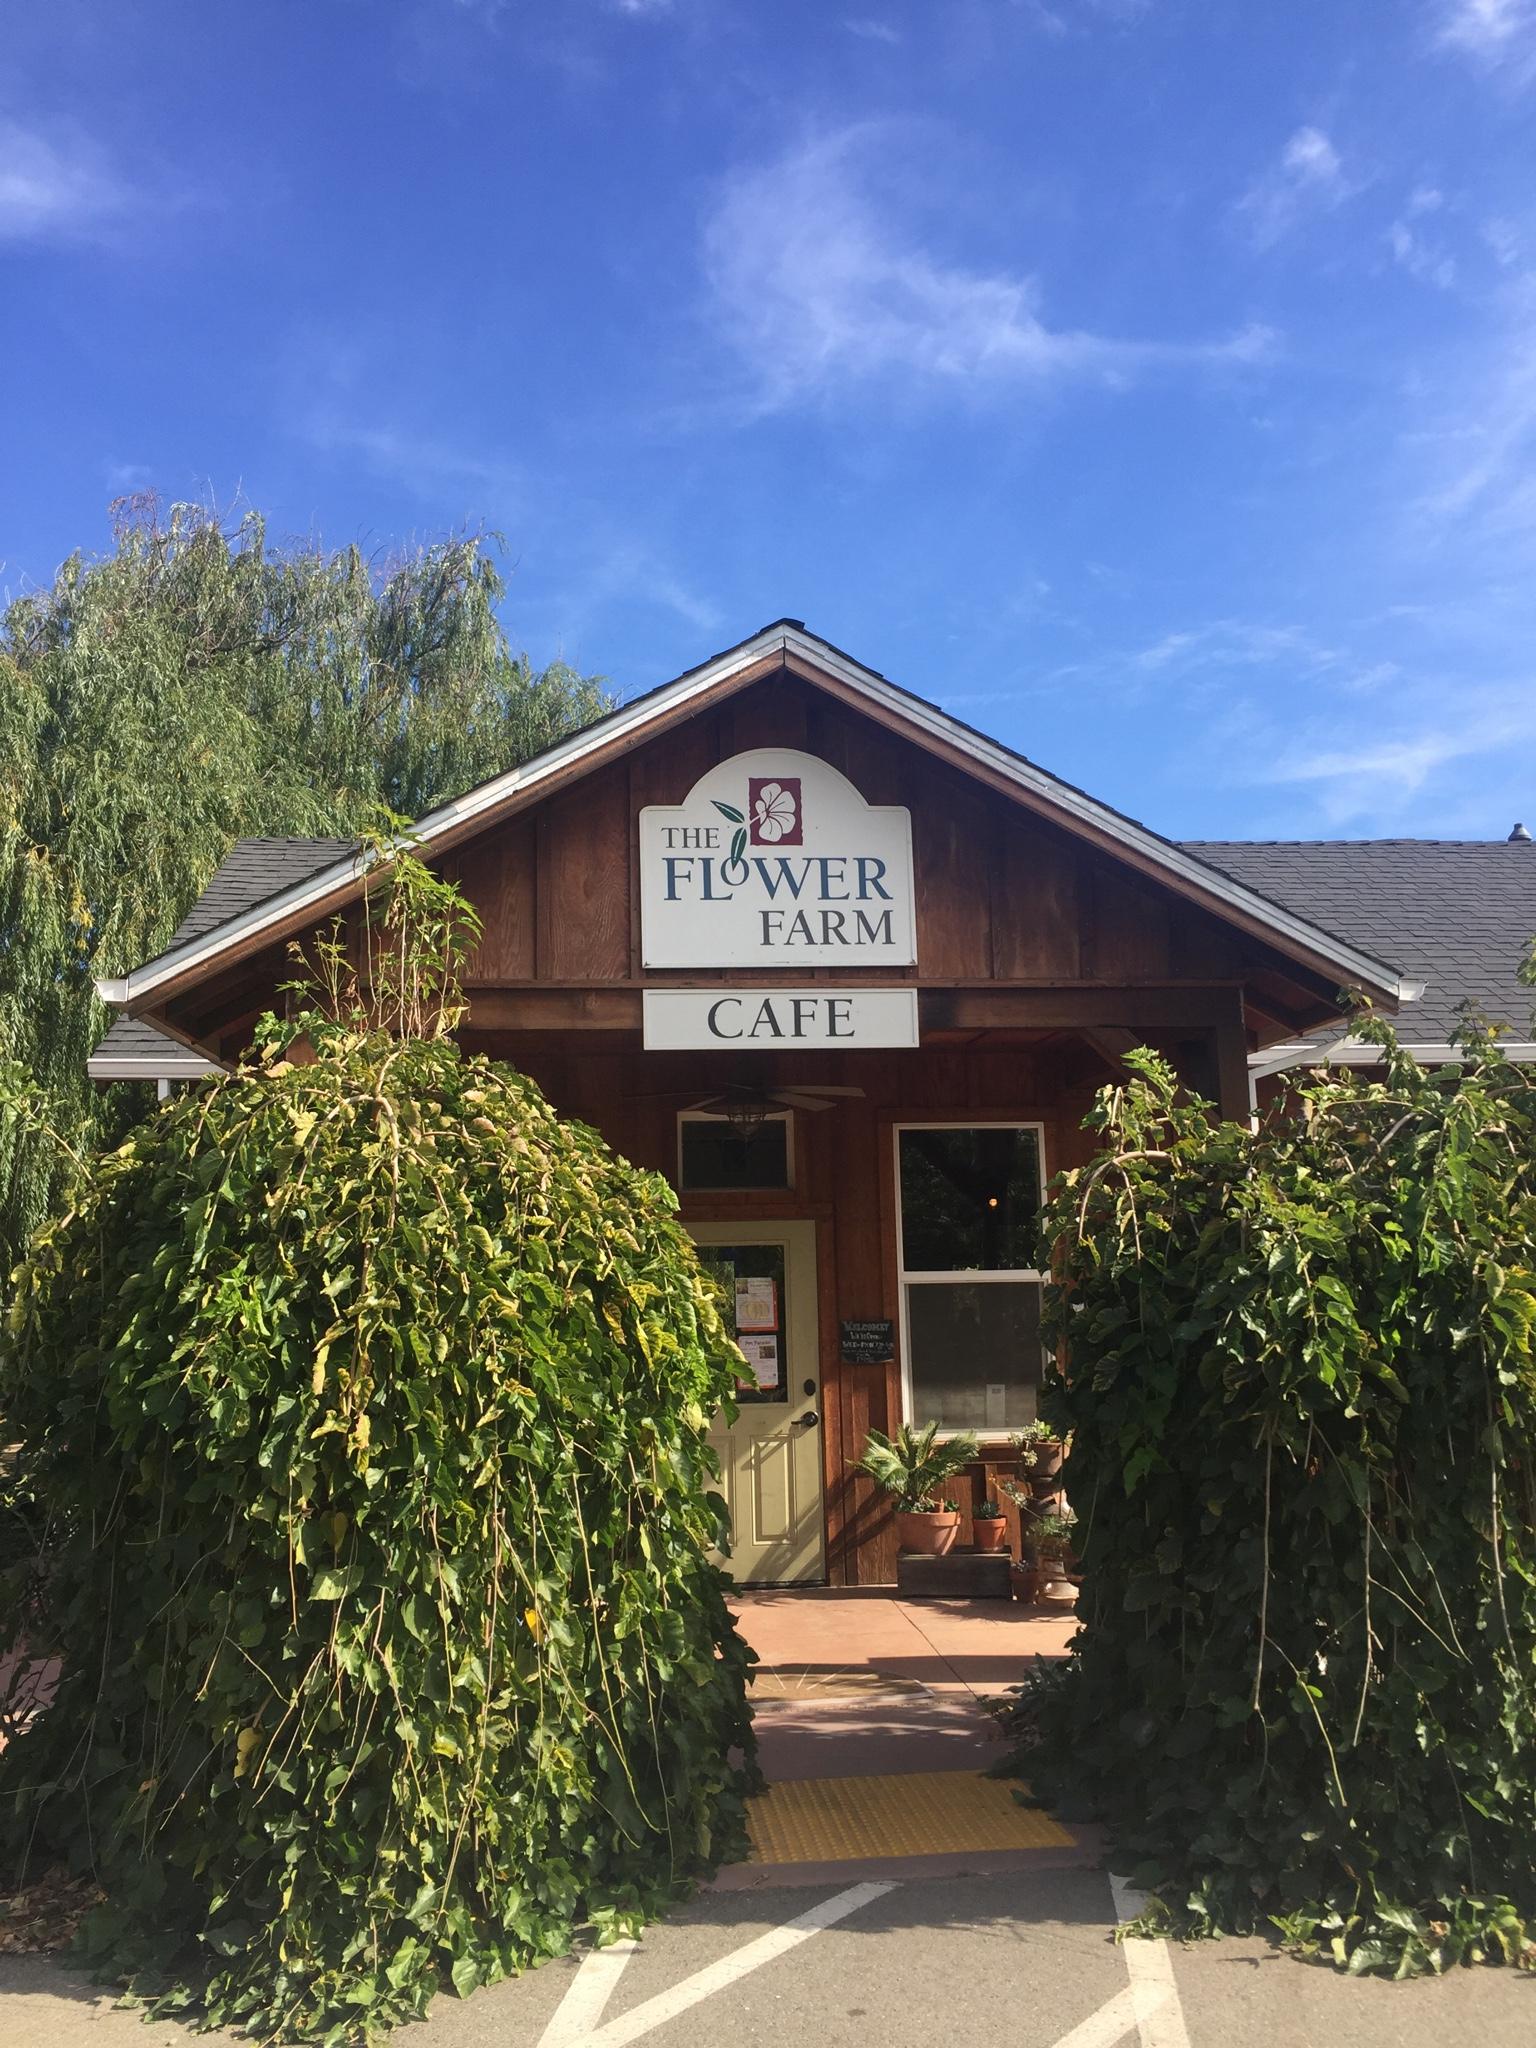 Flower Farm Cafe 9280 Horseshoe Bar Rd Loomis Ca 95650 Yp